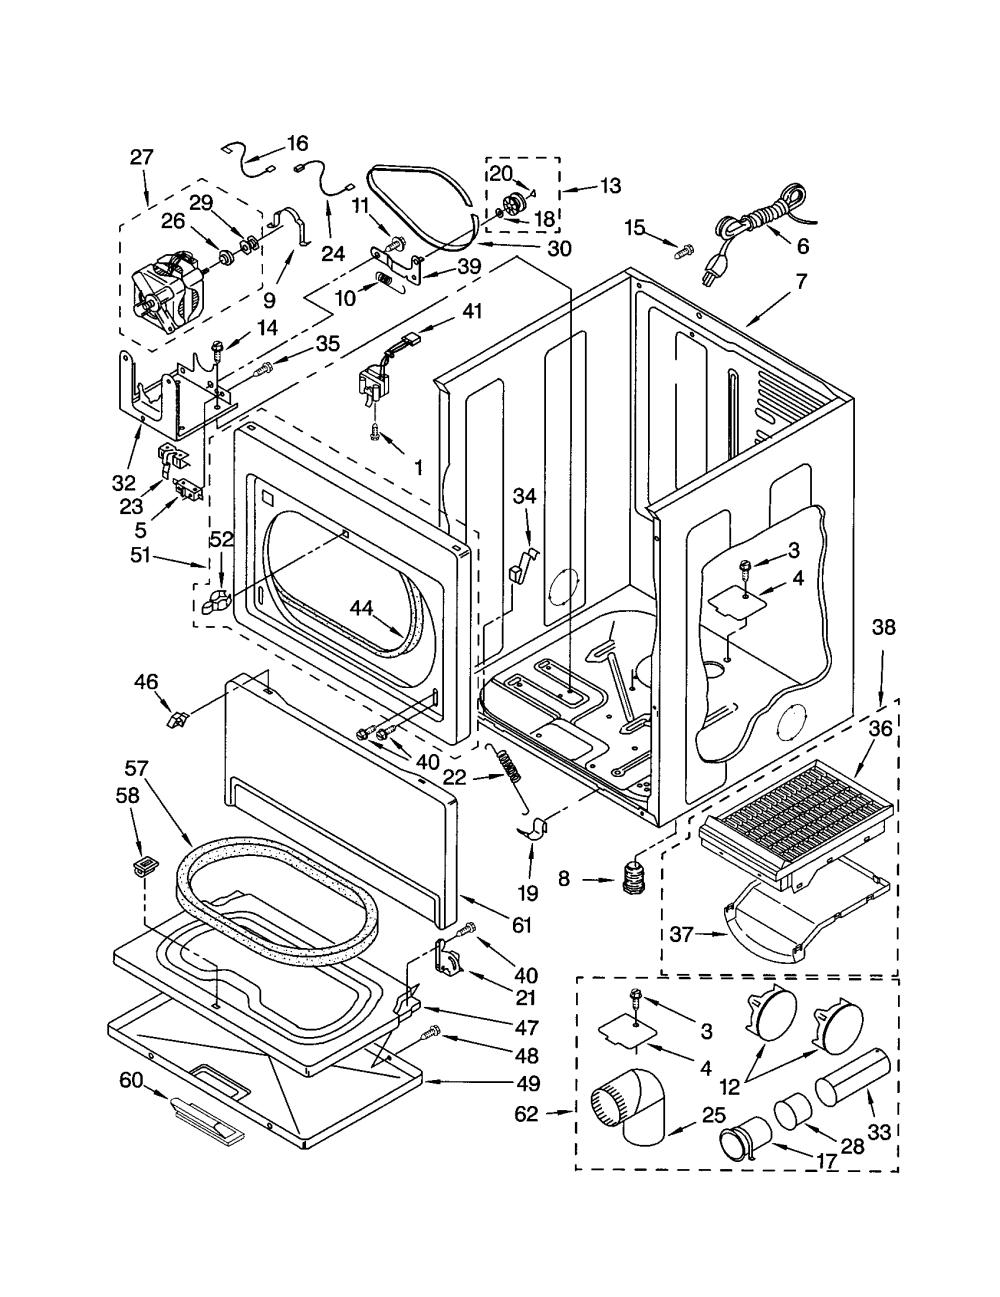 medium resolution of kenmore elite heating element wiring diagram